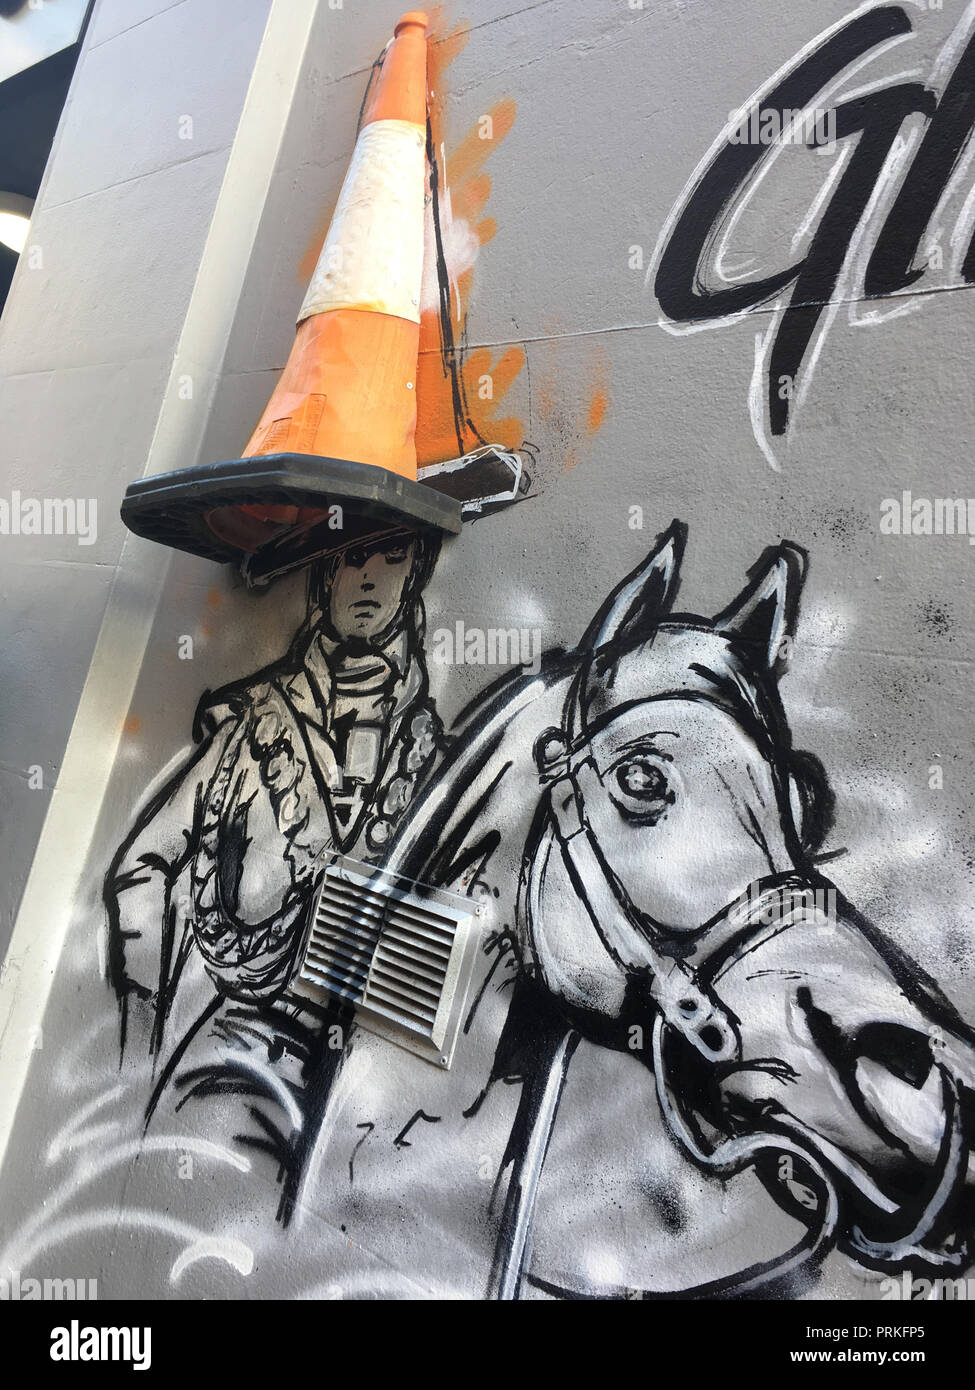 Duke of Wellington with police cone on his head, Glasgow, Scotland. - Stock Image